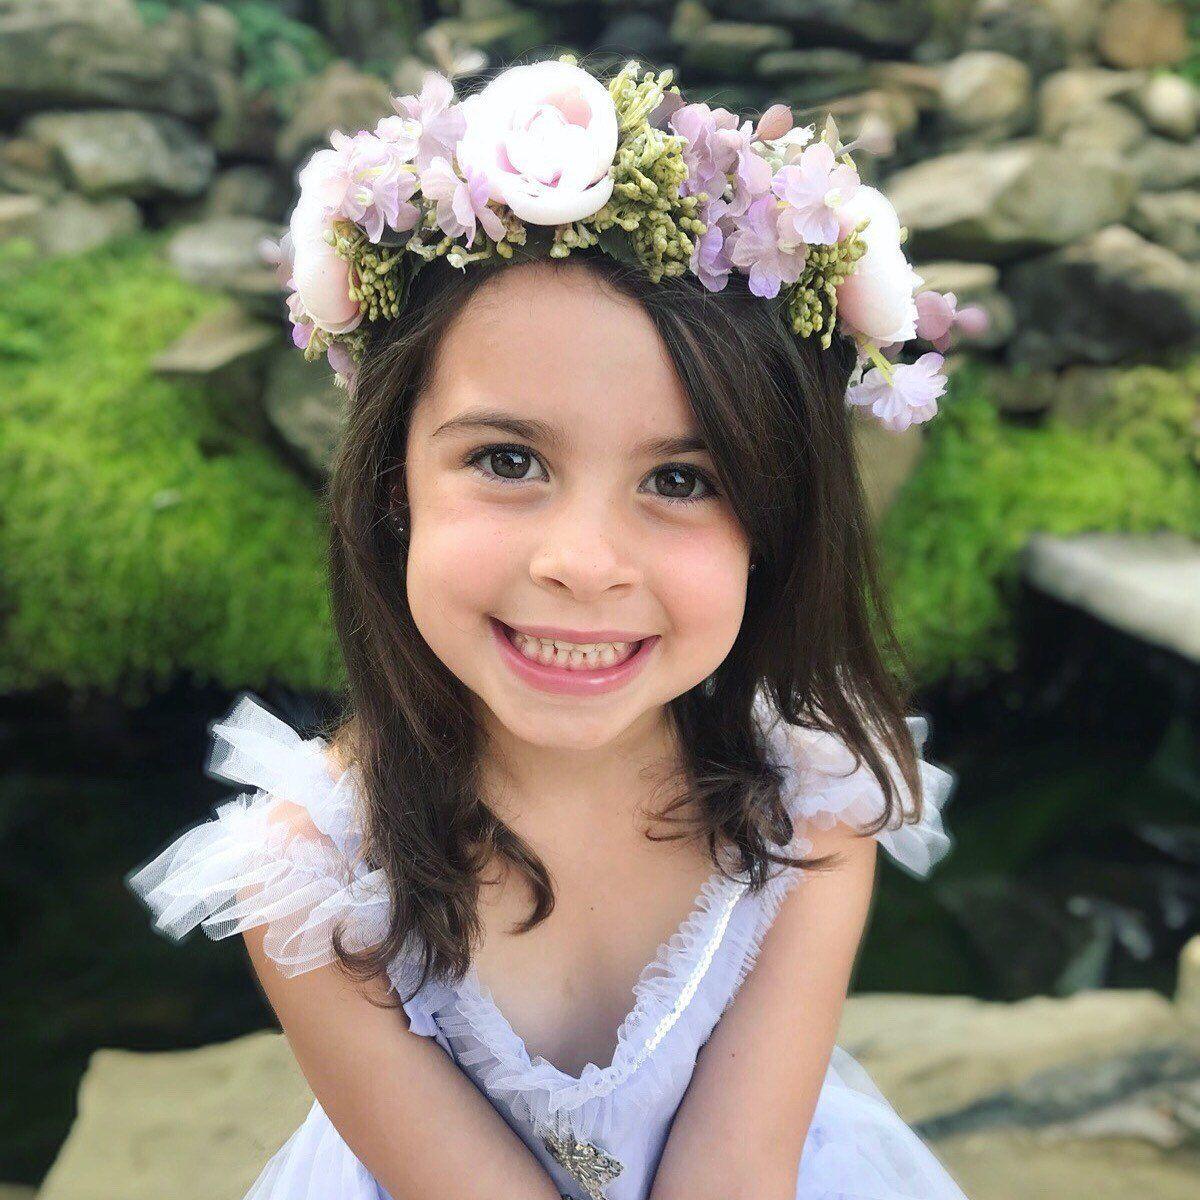 Purple flower girl crown for your wedding pittsburgh weddings